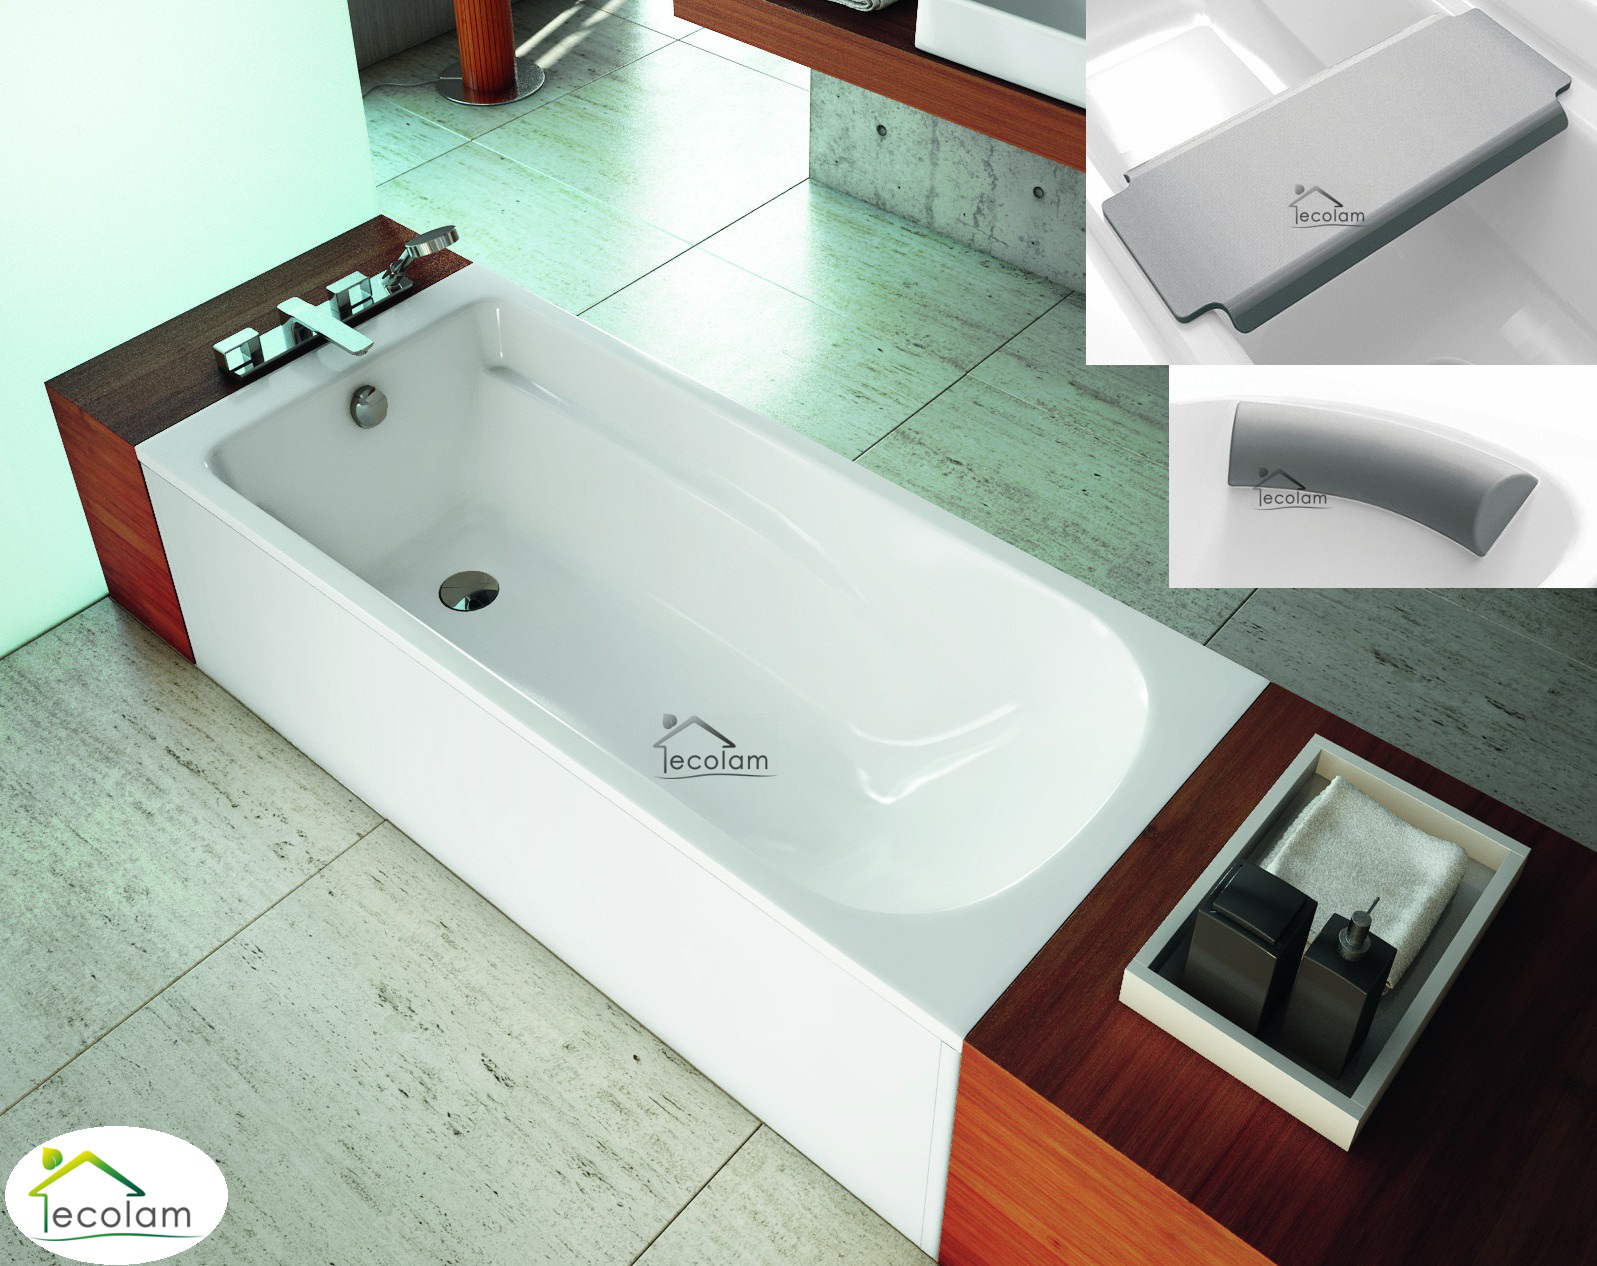 badewanne rechteck wanne 160 x 80 cm f e kopfst tze sitz acryl ablauf kolo c. Black Bedroom Furniture Sets. Home Design Ideas